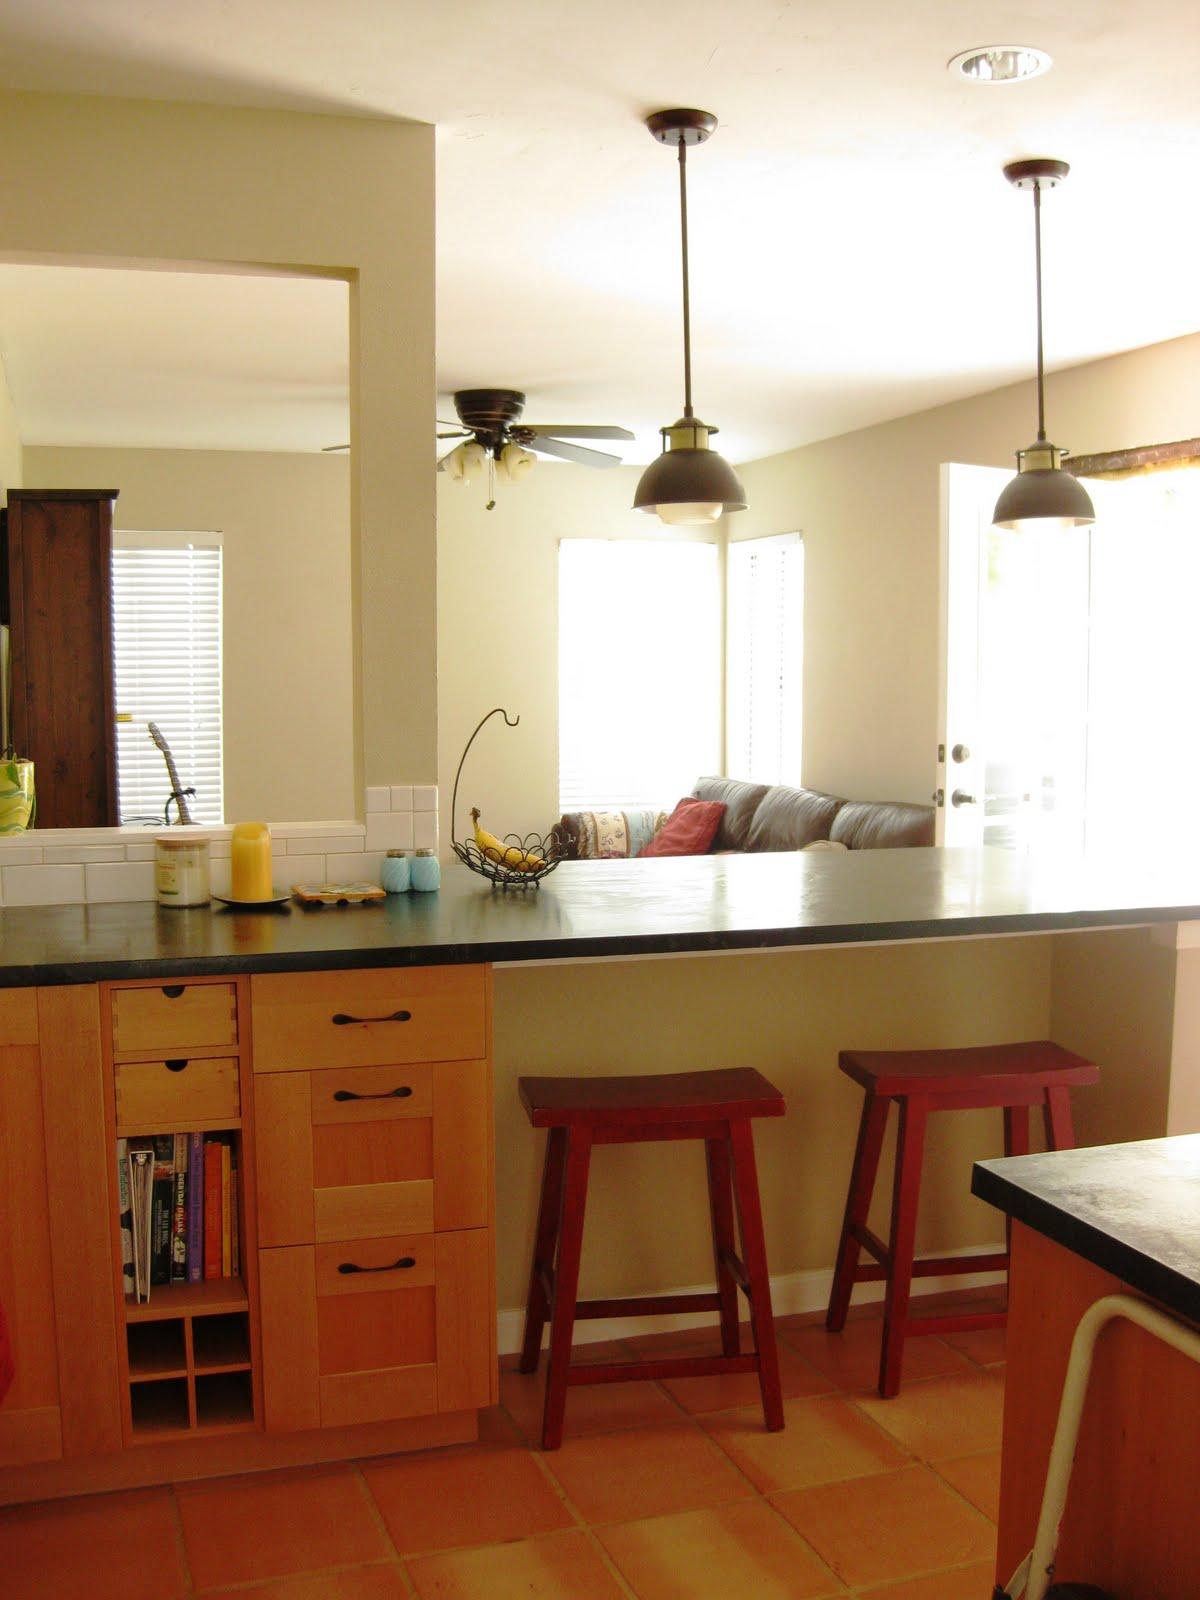 chiara runs kitchen remodel budget breakdown